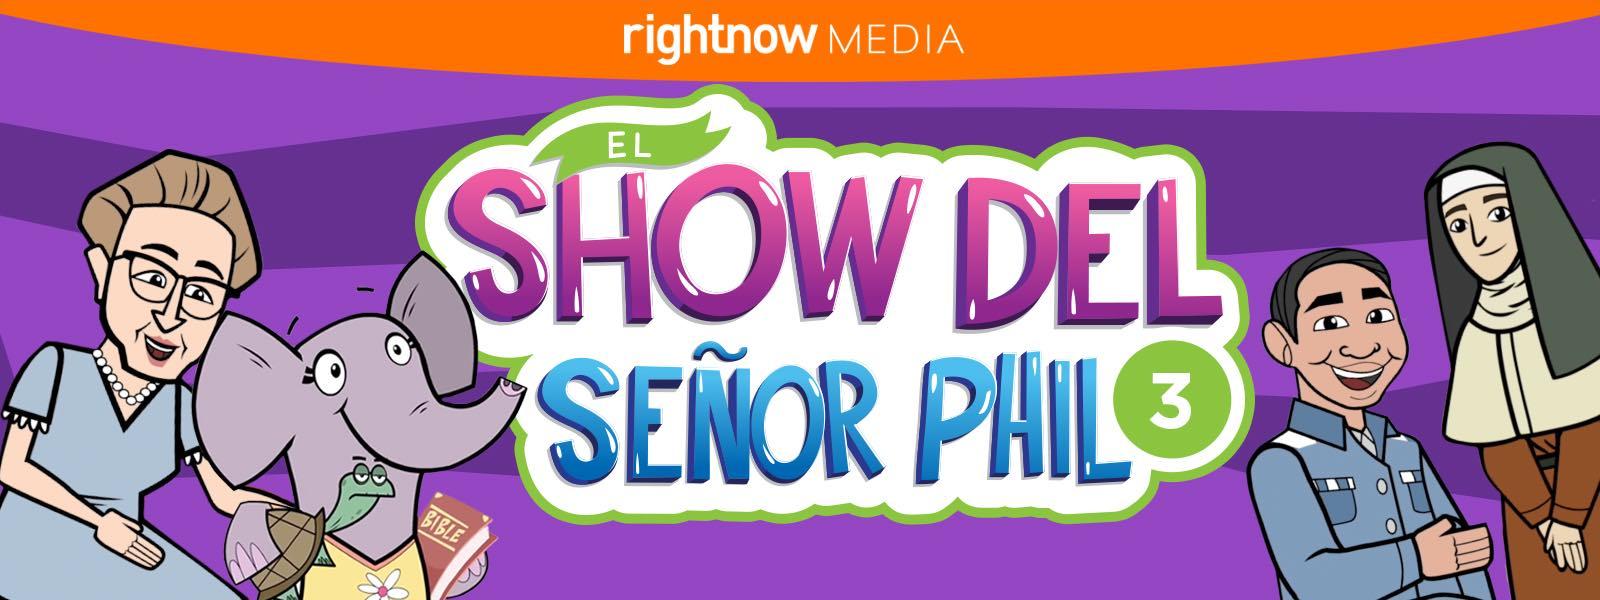 El show del Señor Phil 3